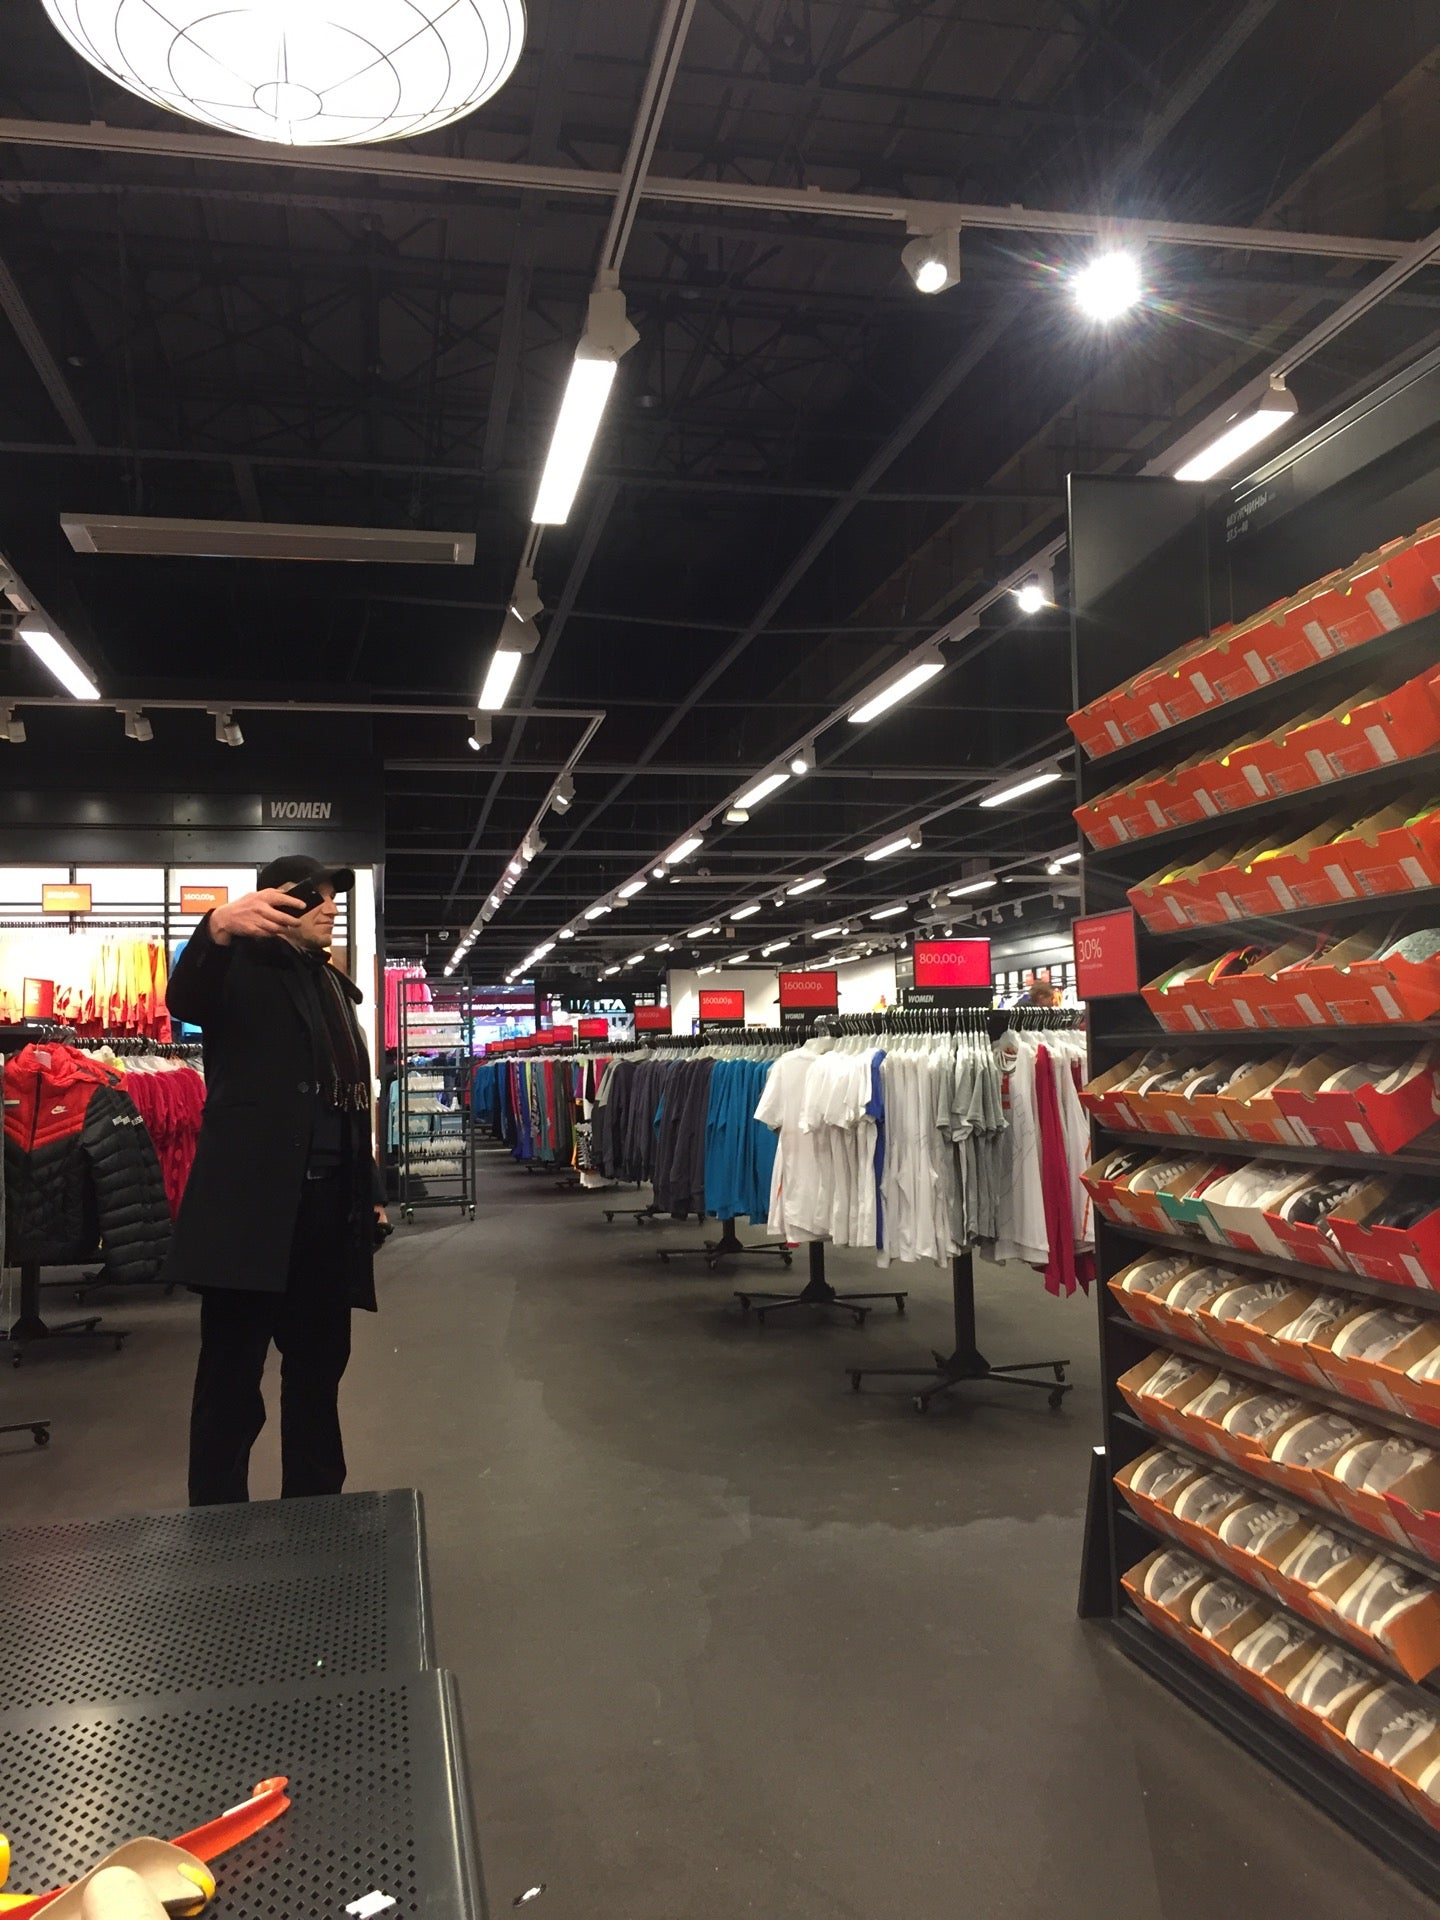 db70a48f Nike Дисконт Центр на Орджоникидзе, отзывы о спортивных магазинах ...